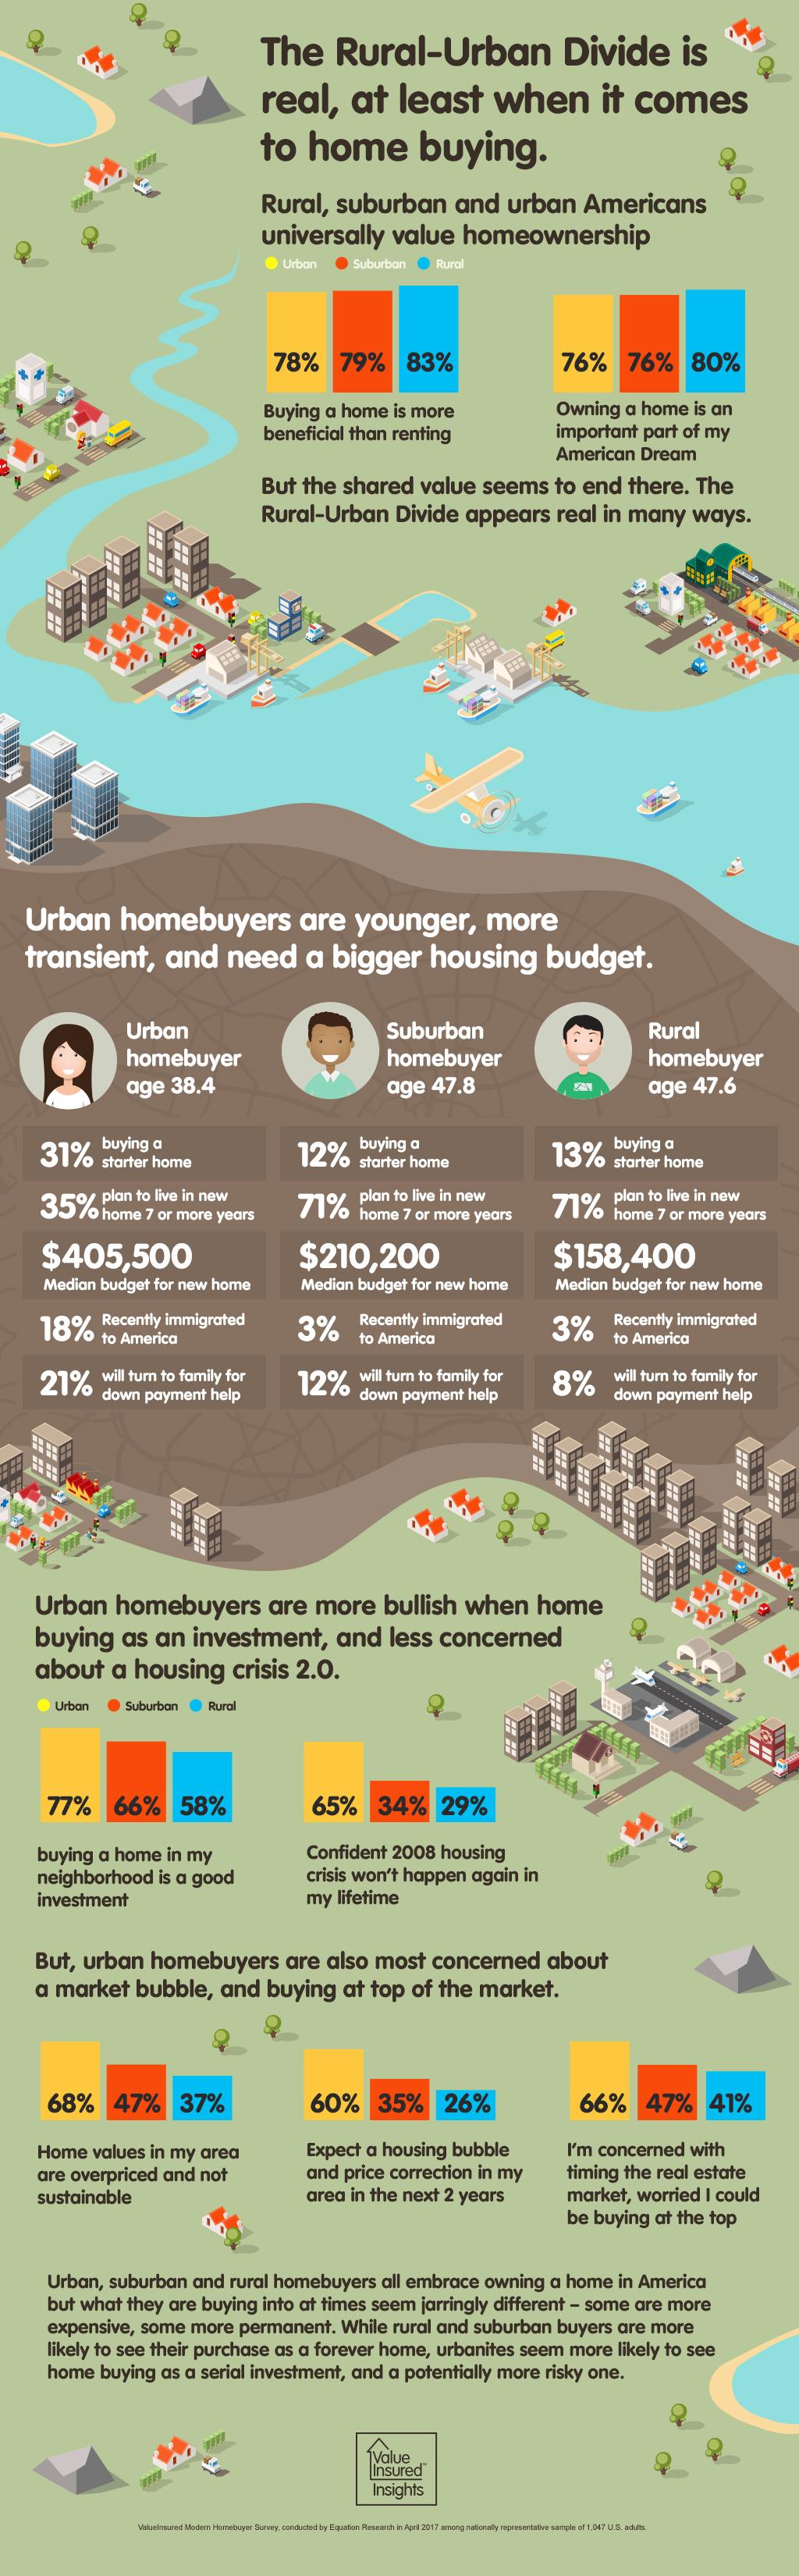 Rural-Urban Divide Infographic